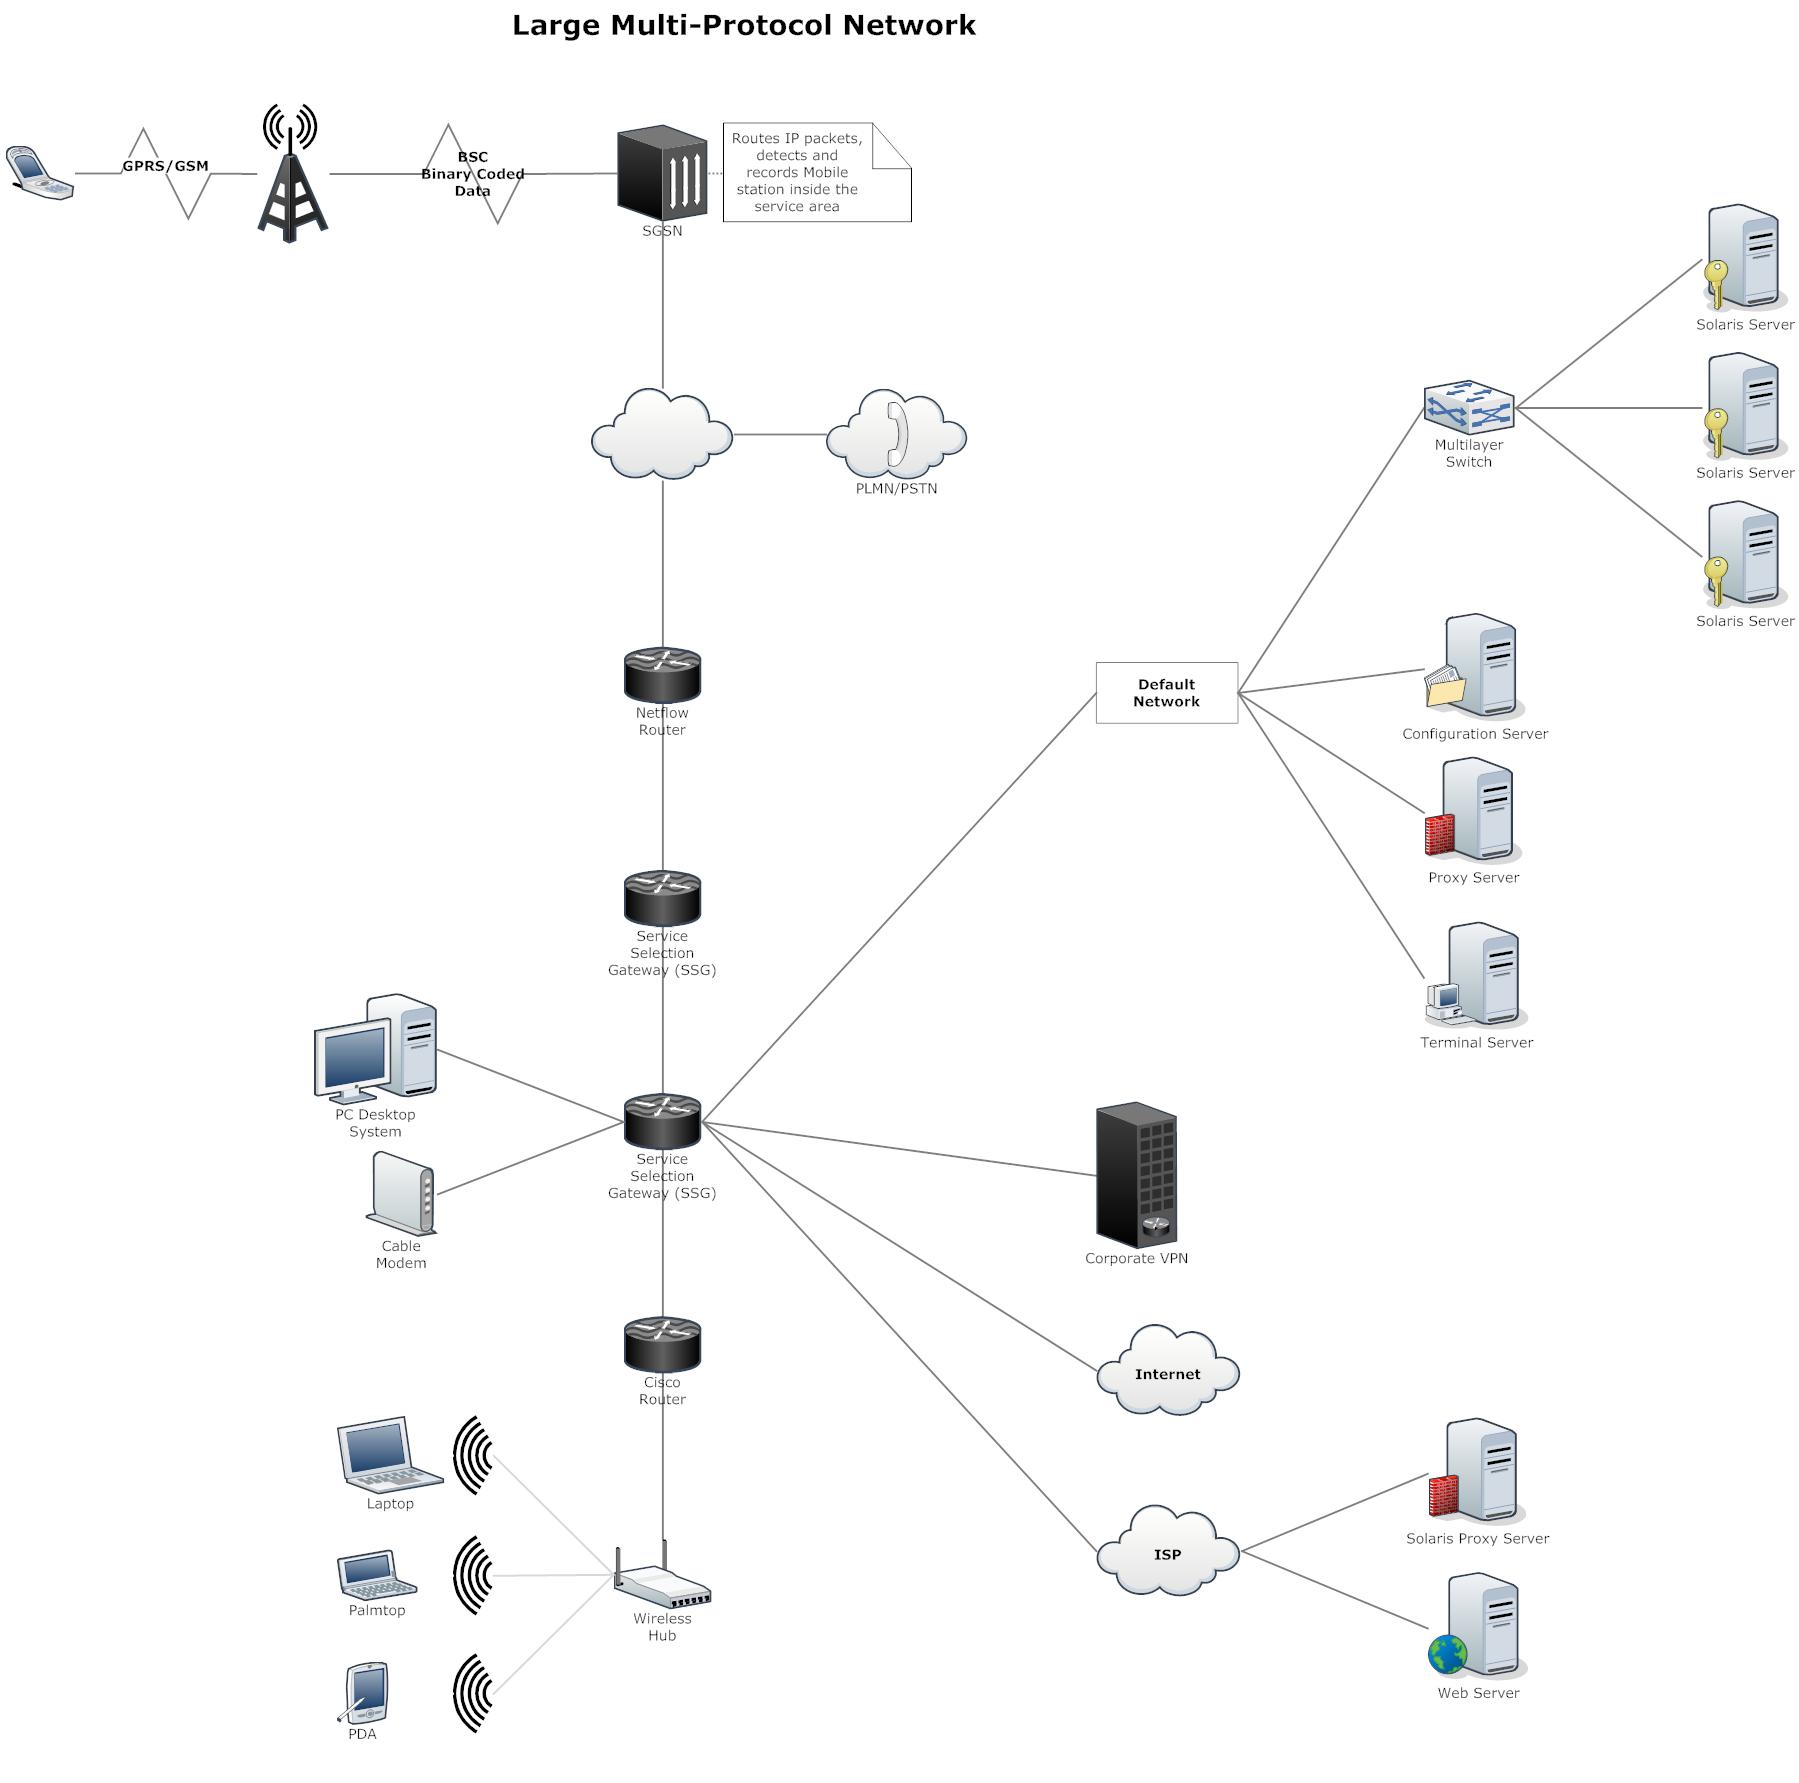 medium resolution of network diagram example large multi protocol network